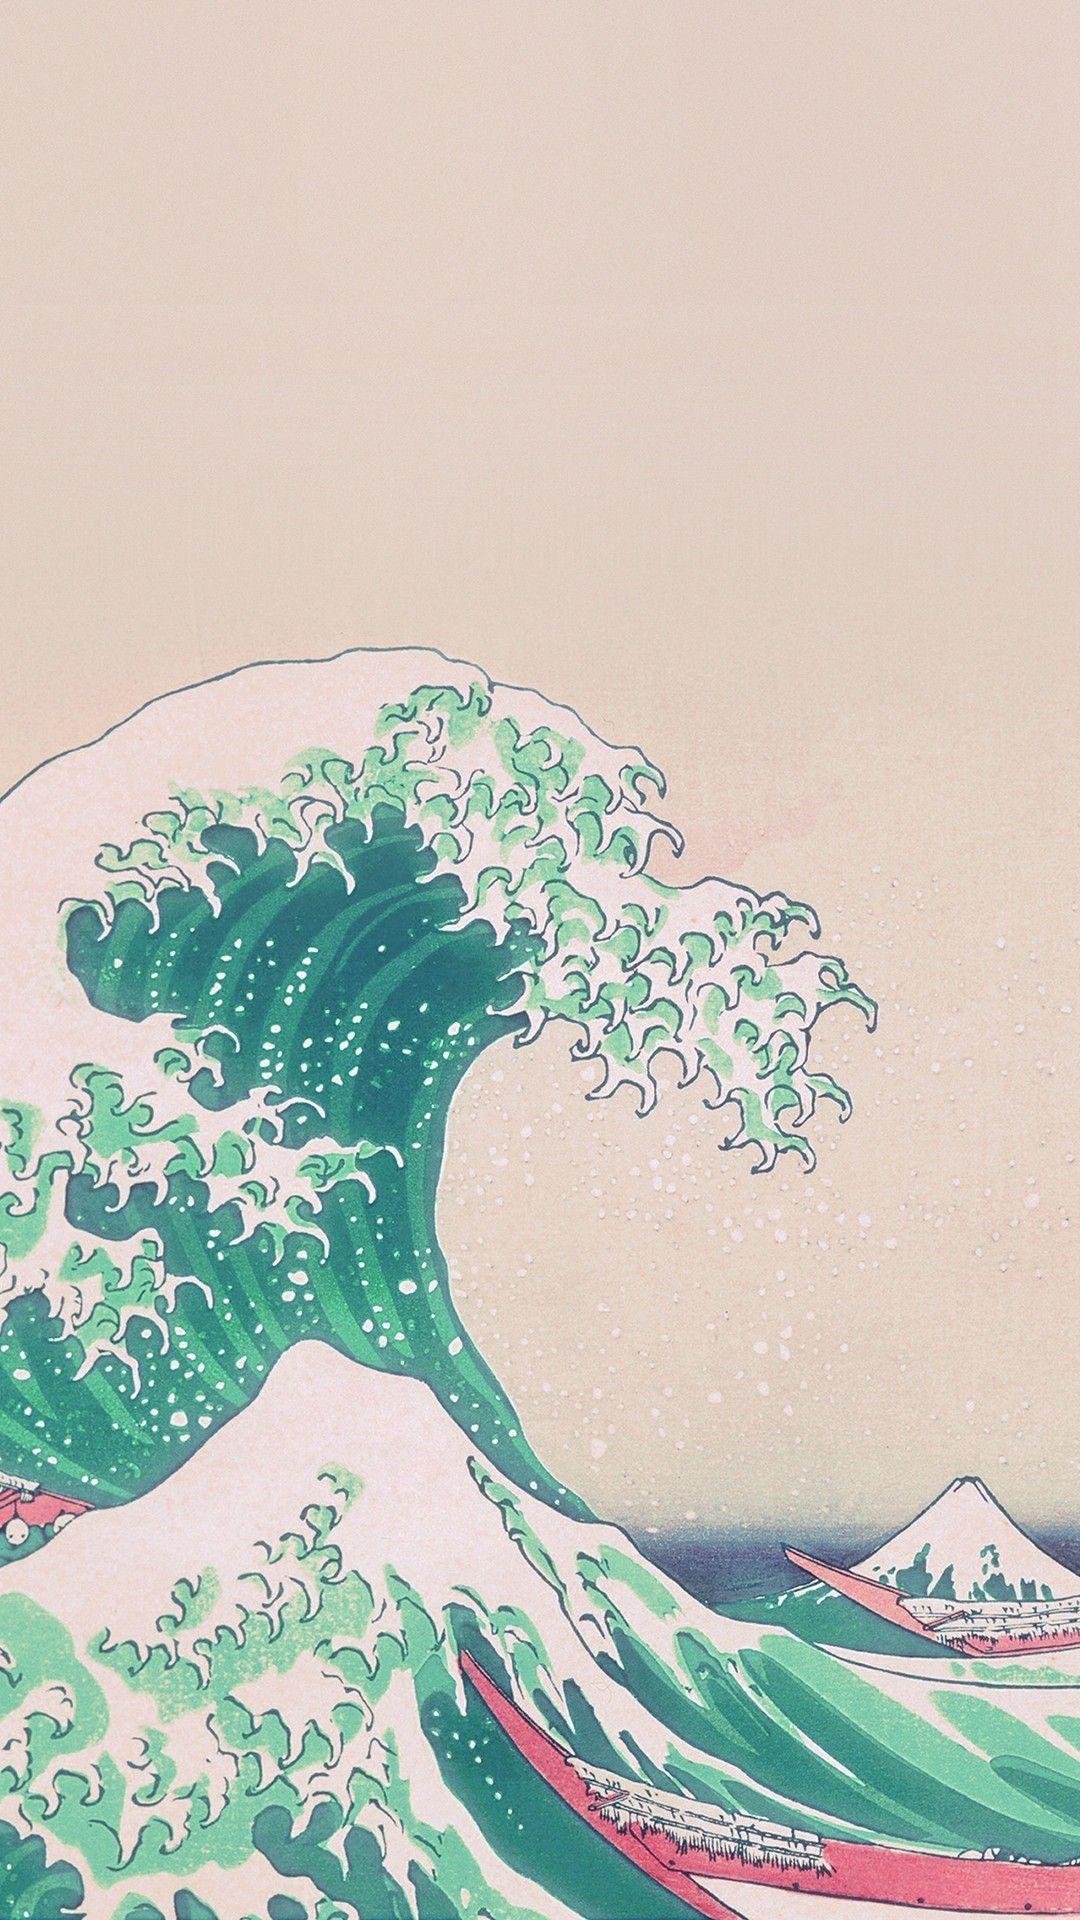 Japanese Art Wallpapers Iphone Wallpaper Waves Wallpaper Aesthetic Iphone Wallpaper Aesthetic Wallpapers